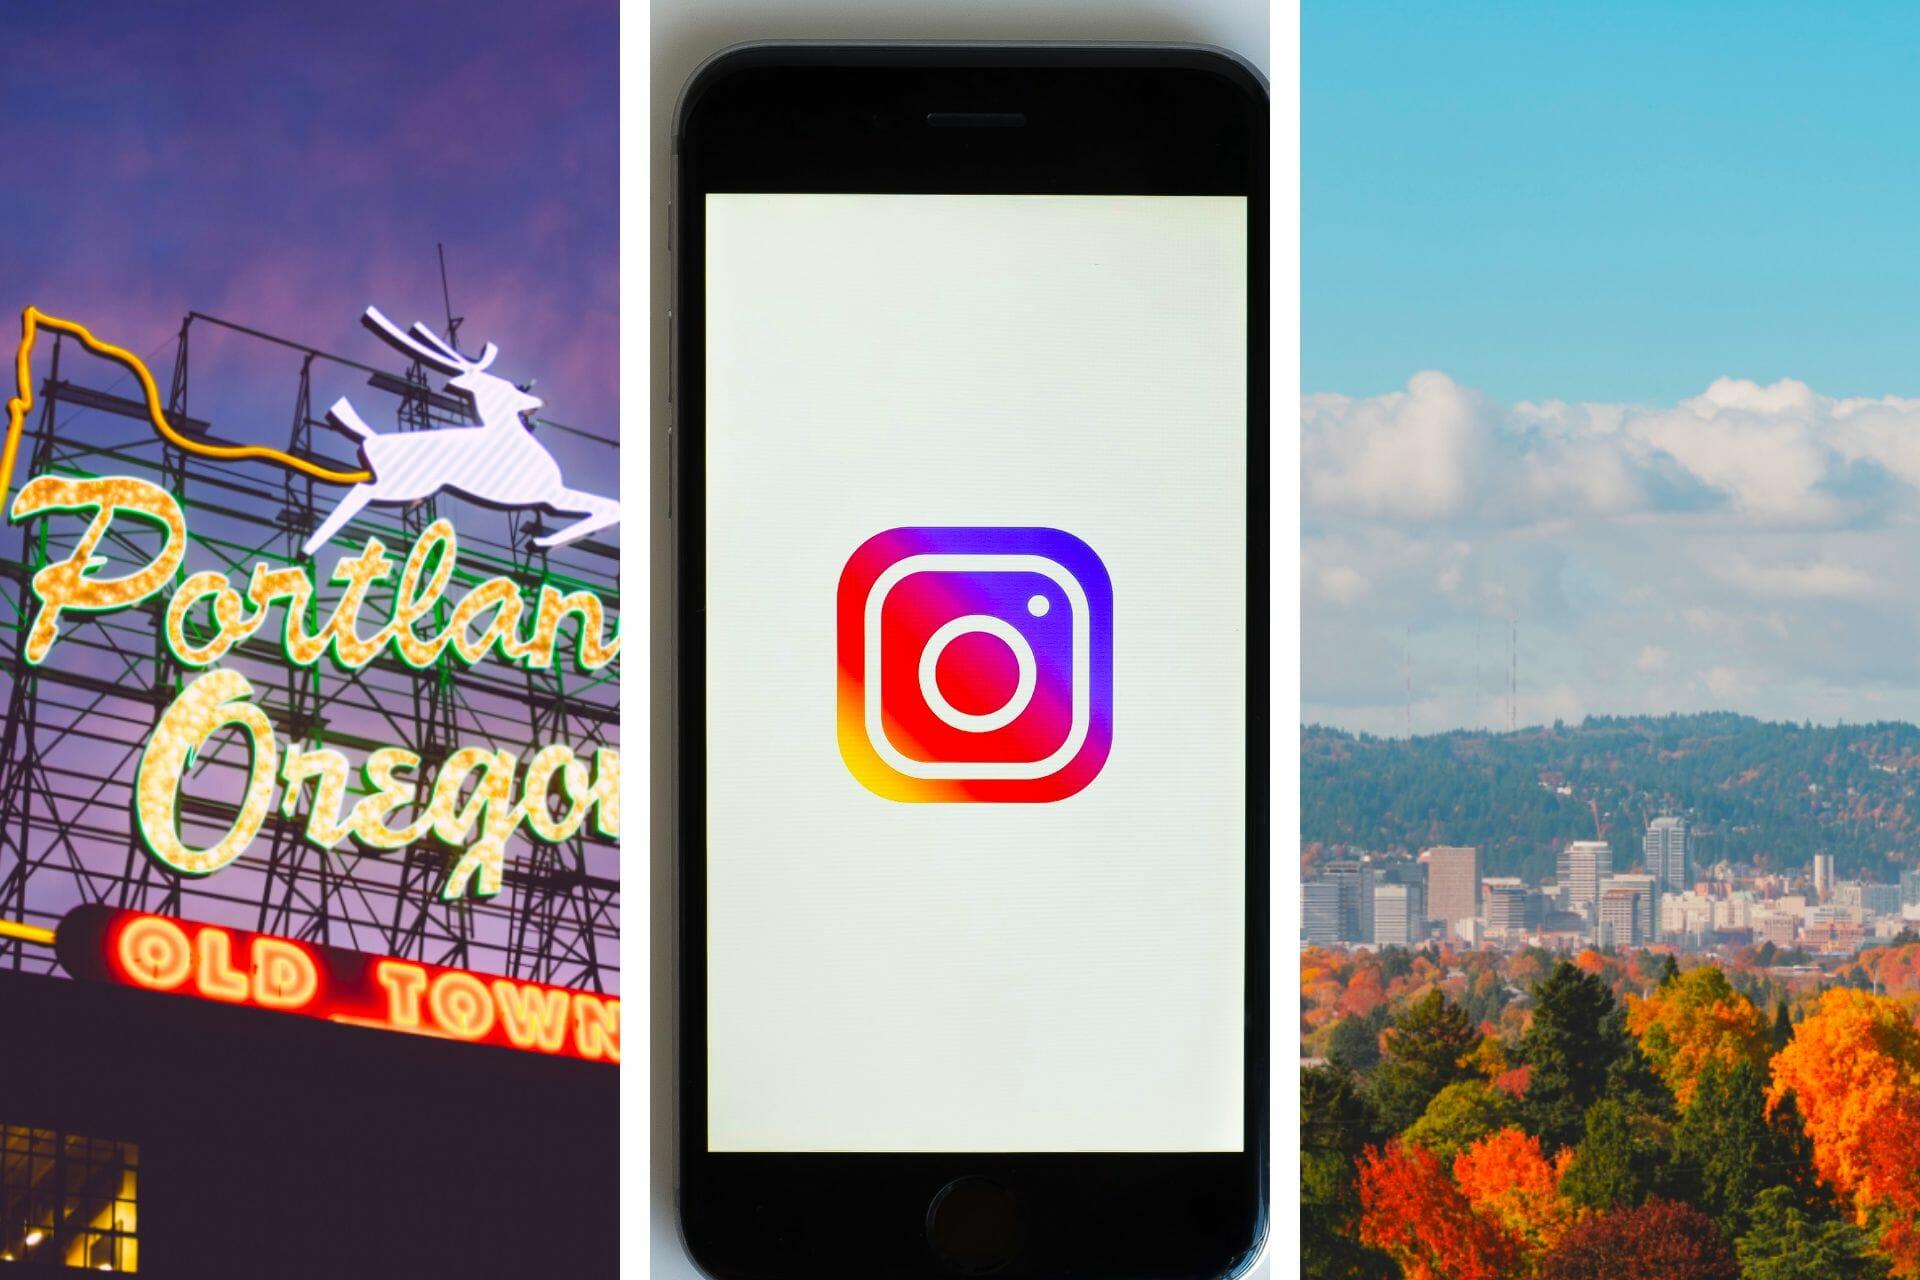 25 Quirky Portland Instagram Captions for the Perfect Post via @allamericanatlas